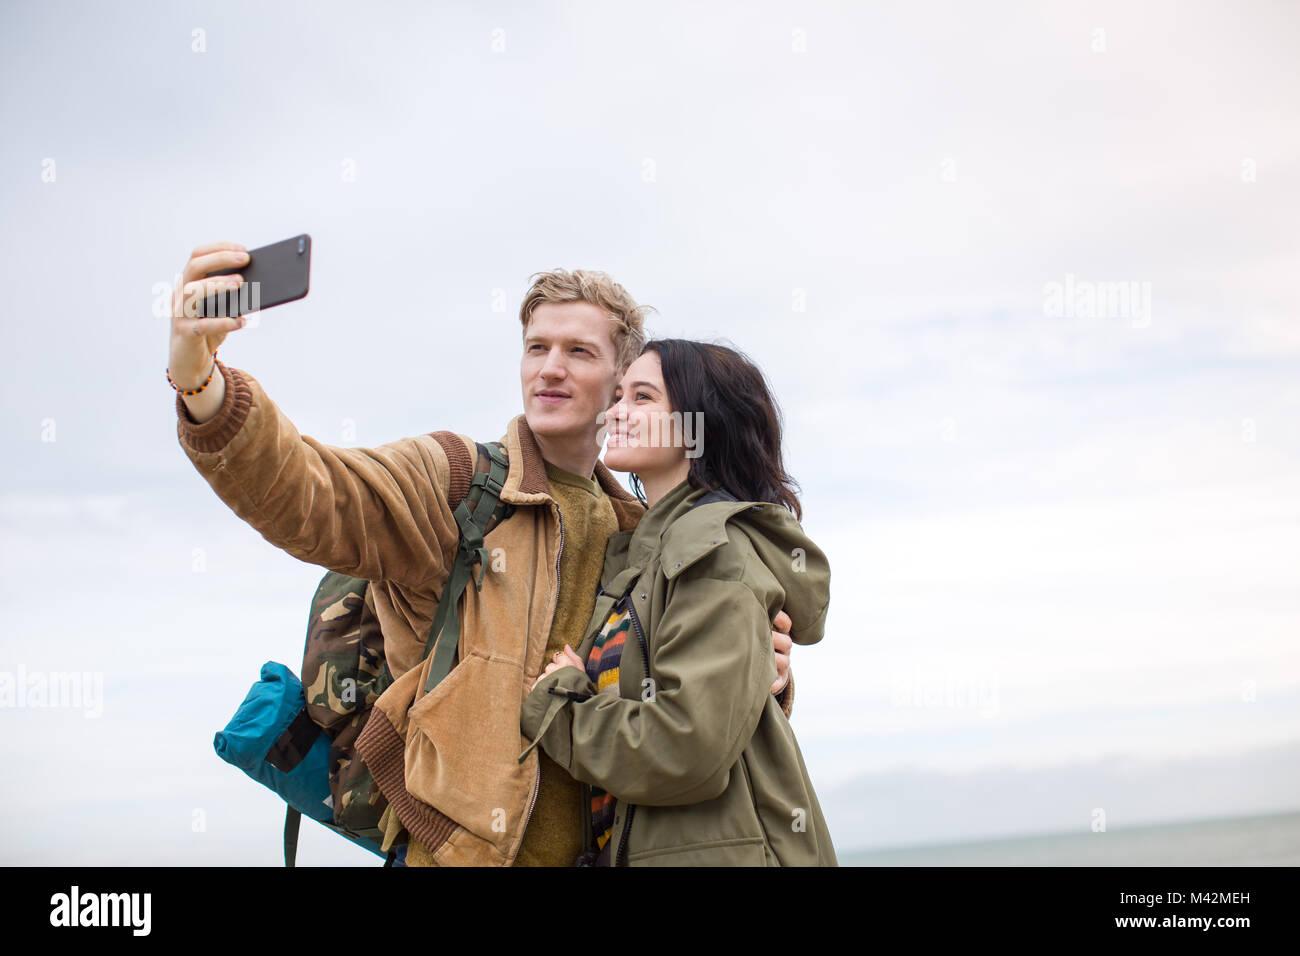 Un couple en voyage campant selfies Photo Stock